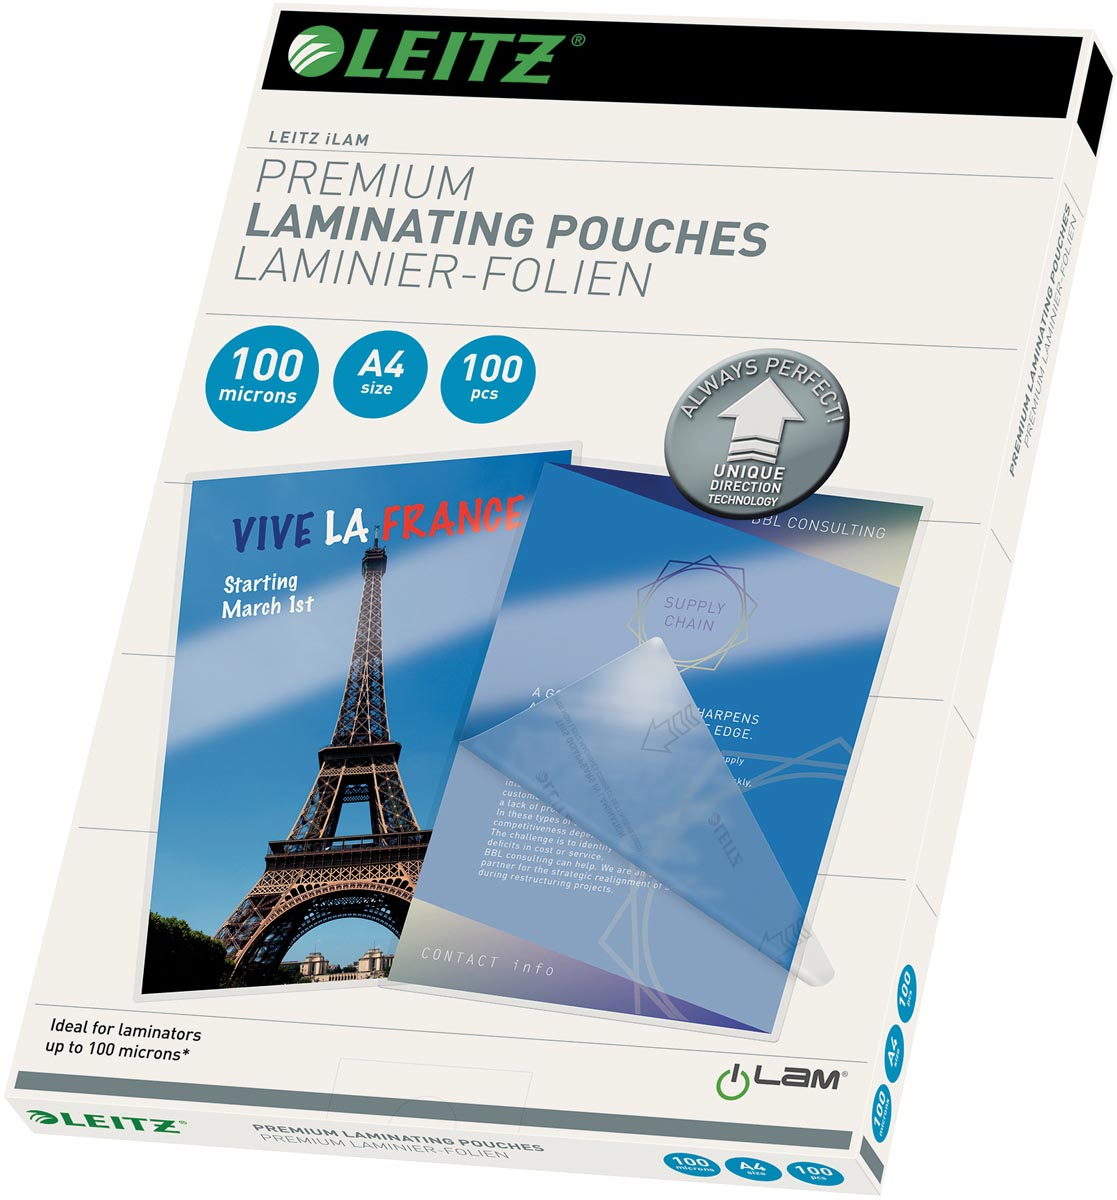 Leitz Ilam lamineerhoes ft A4, 200 micron (2 x 100 micron), pak van 100 stuks